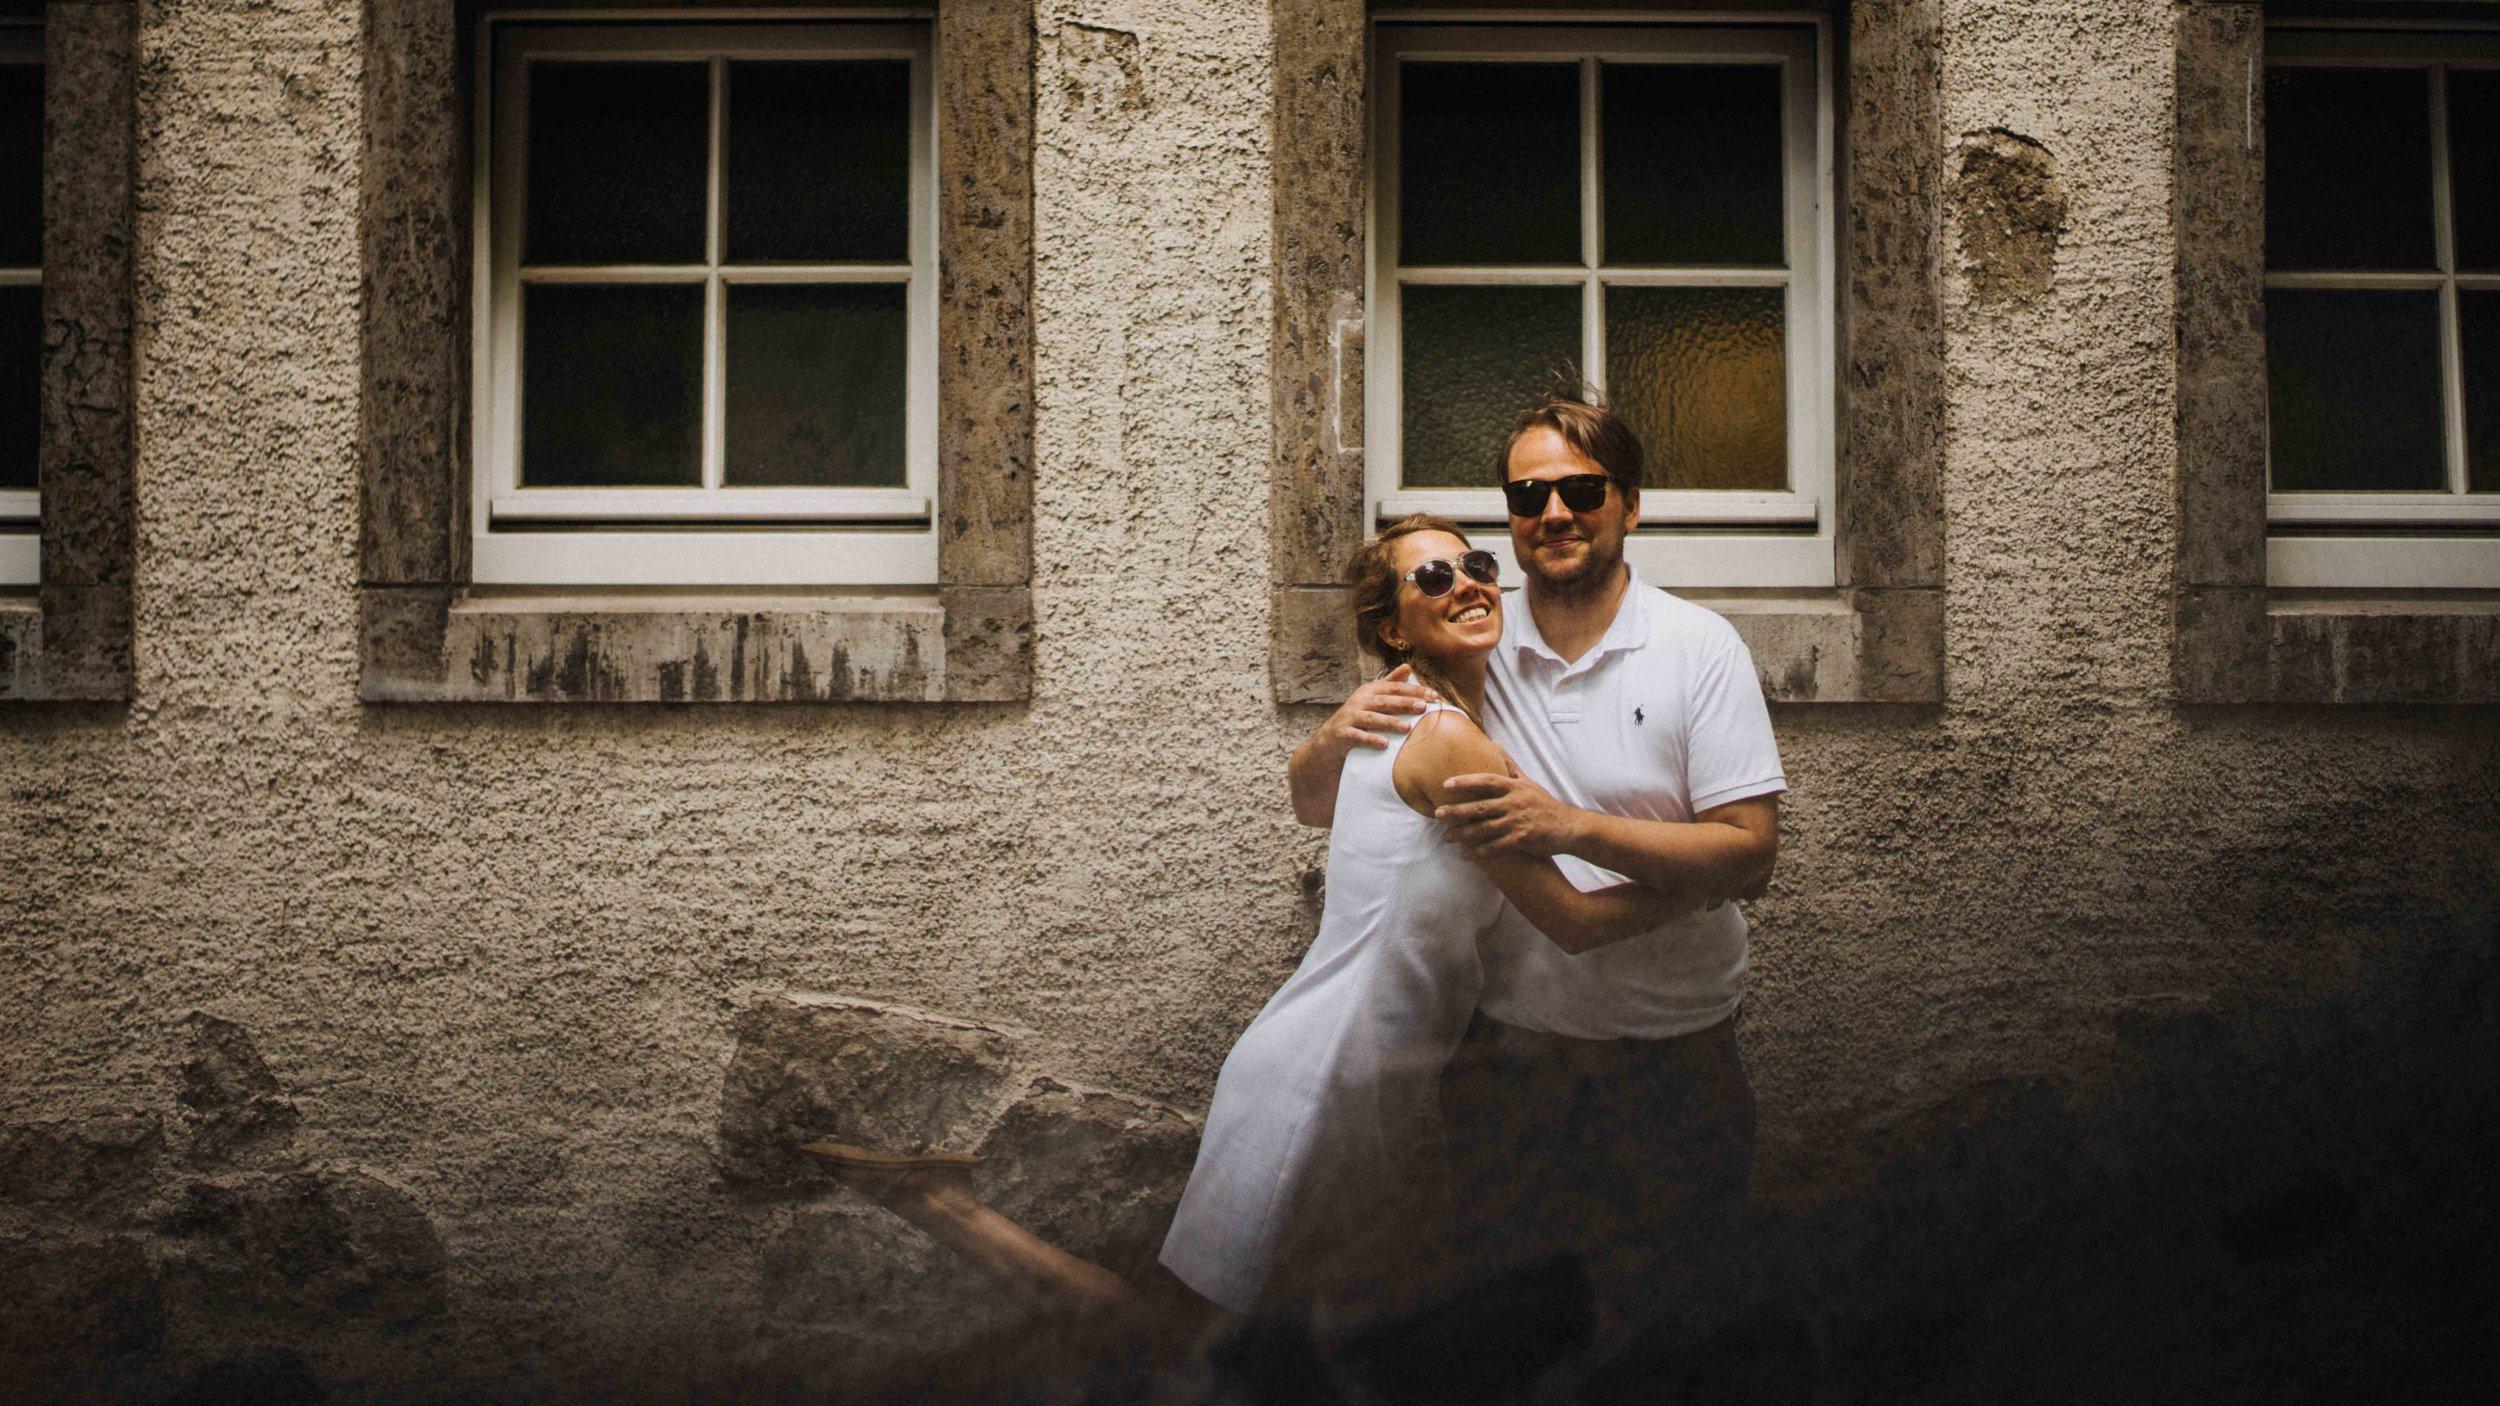 cologne_drachenfels_dusseldorf_germany_wedding_photography_engagement_hochzeit-0463.JPG